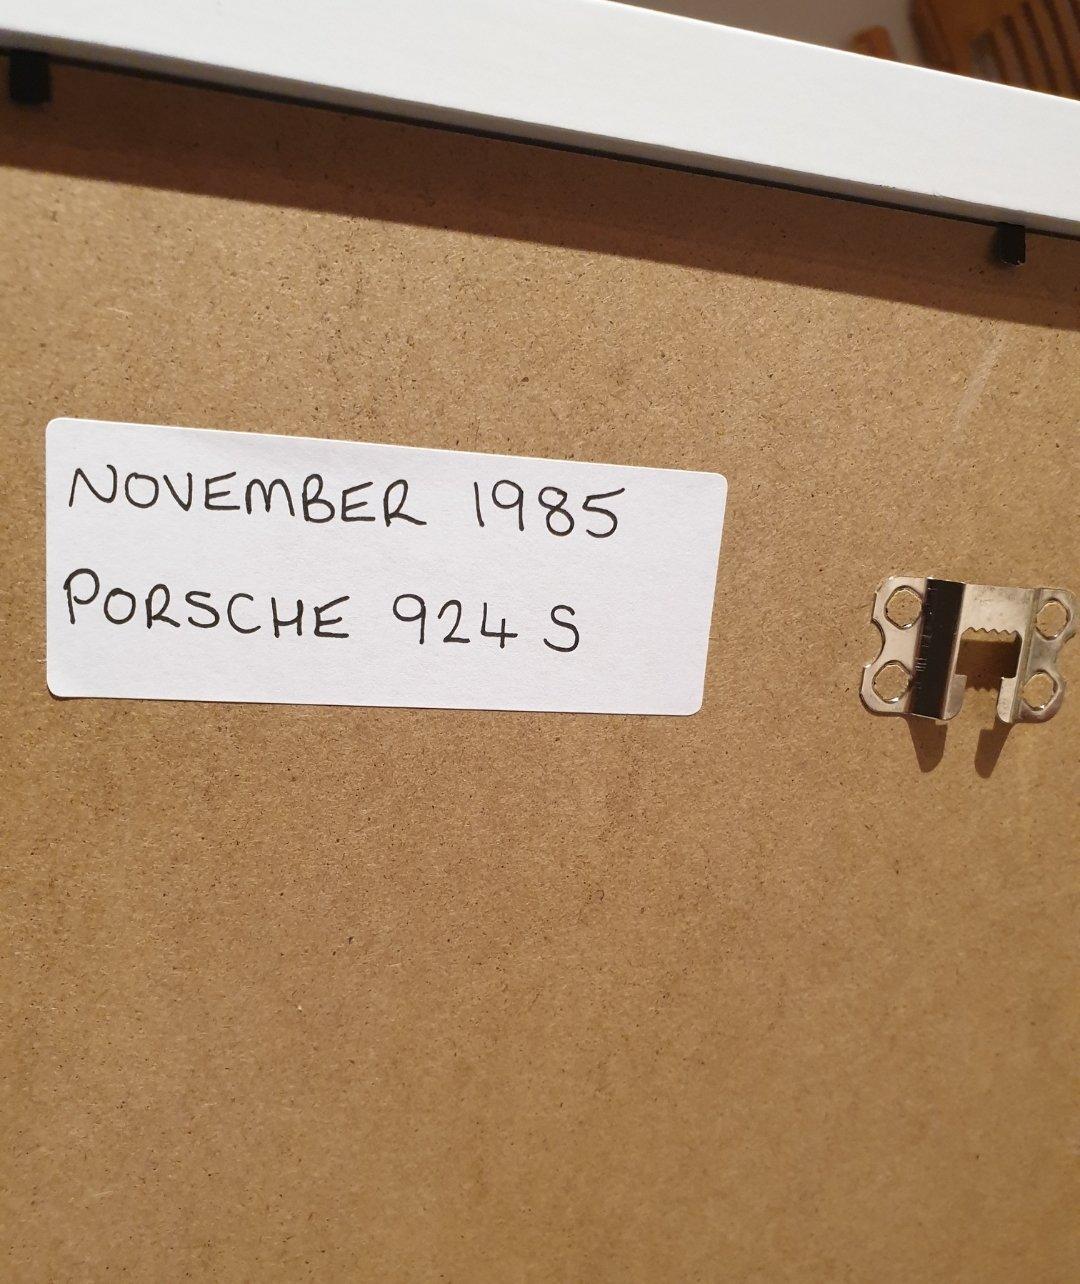 1985 Porsche 924 S Framed Advert Original  For Sale (picture 2 of 2)